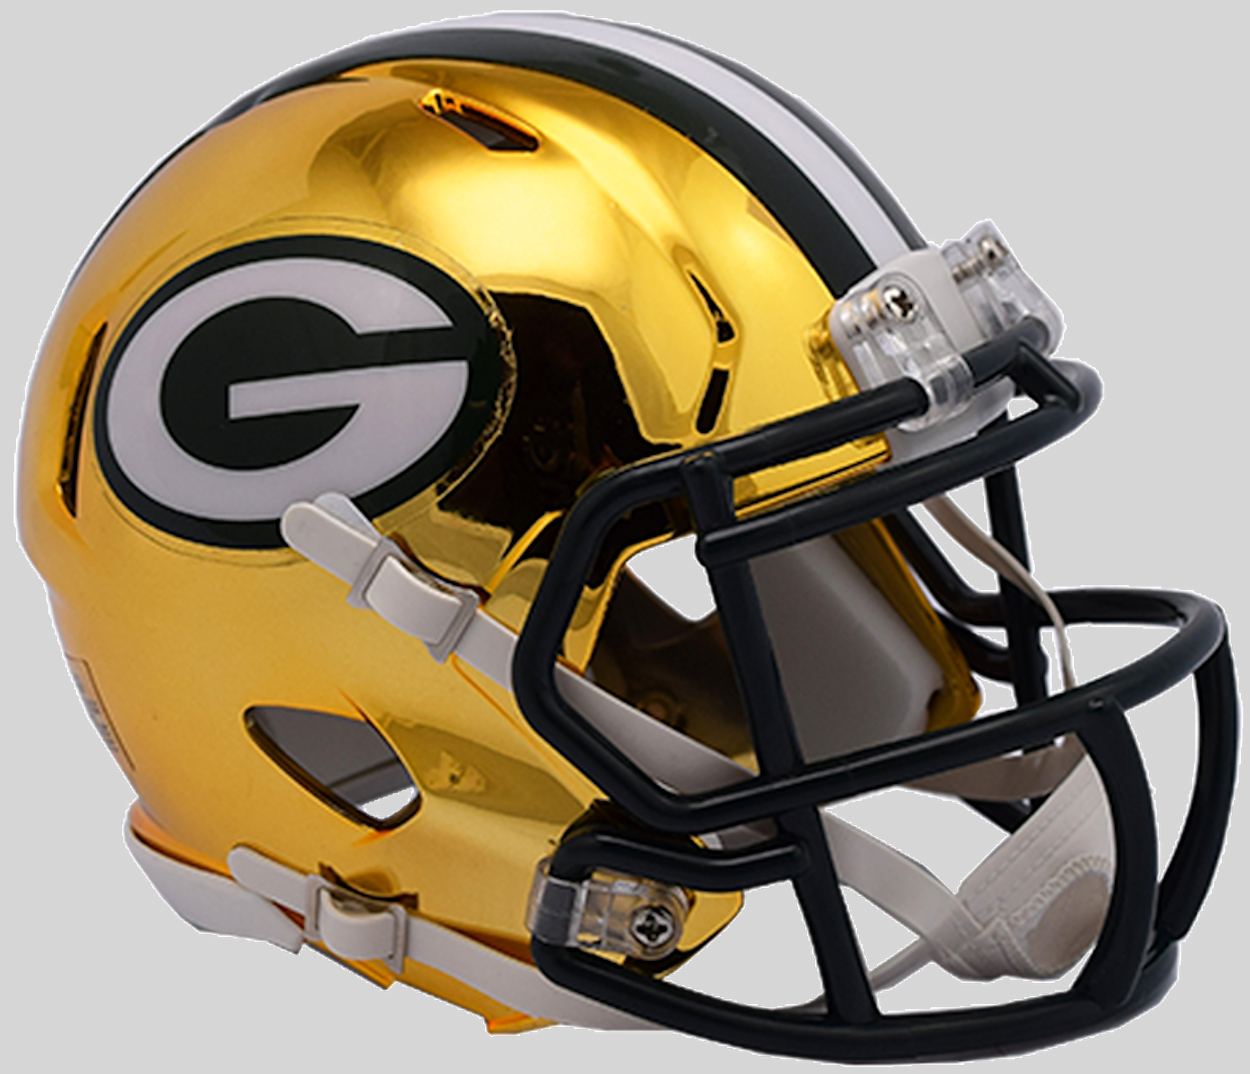 Green Bay Packers NFL Mini Chrome Speed Football Helmet <B>NEW 2018</B>